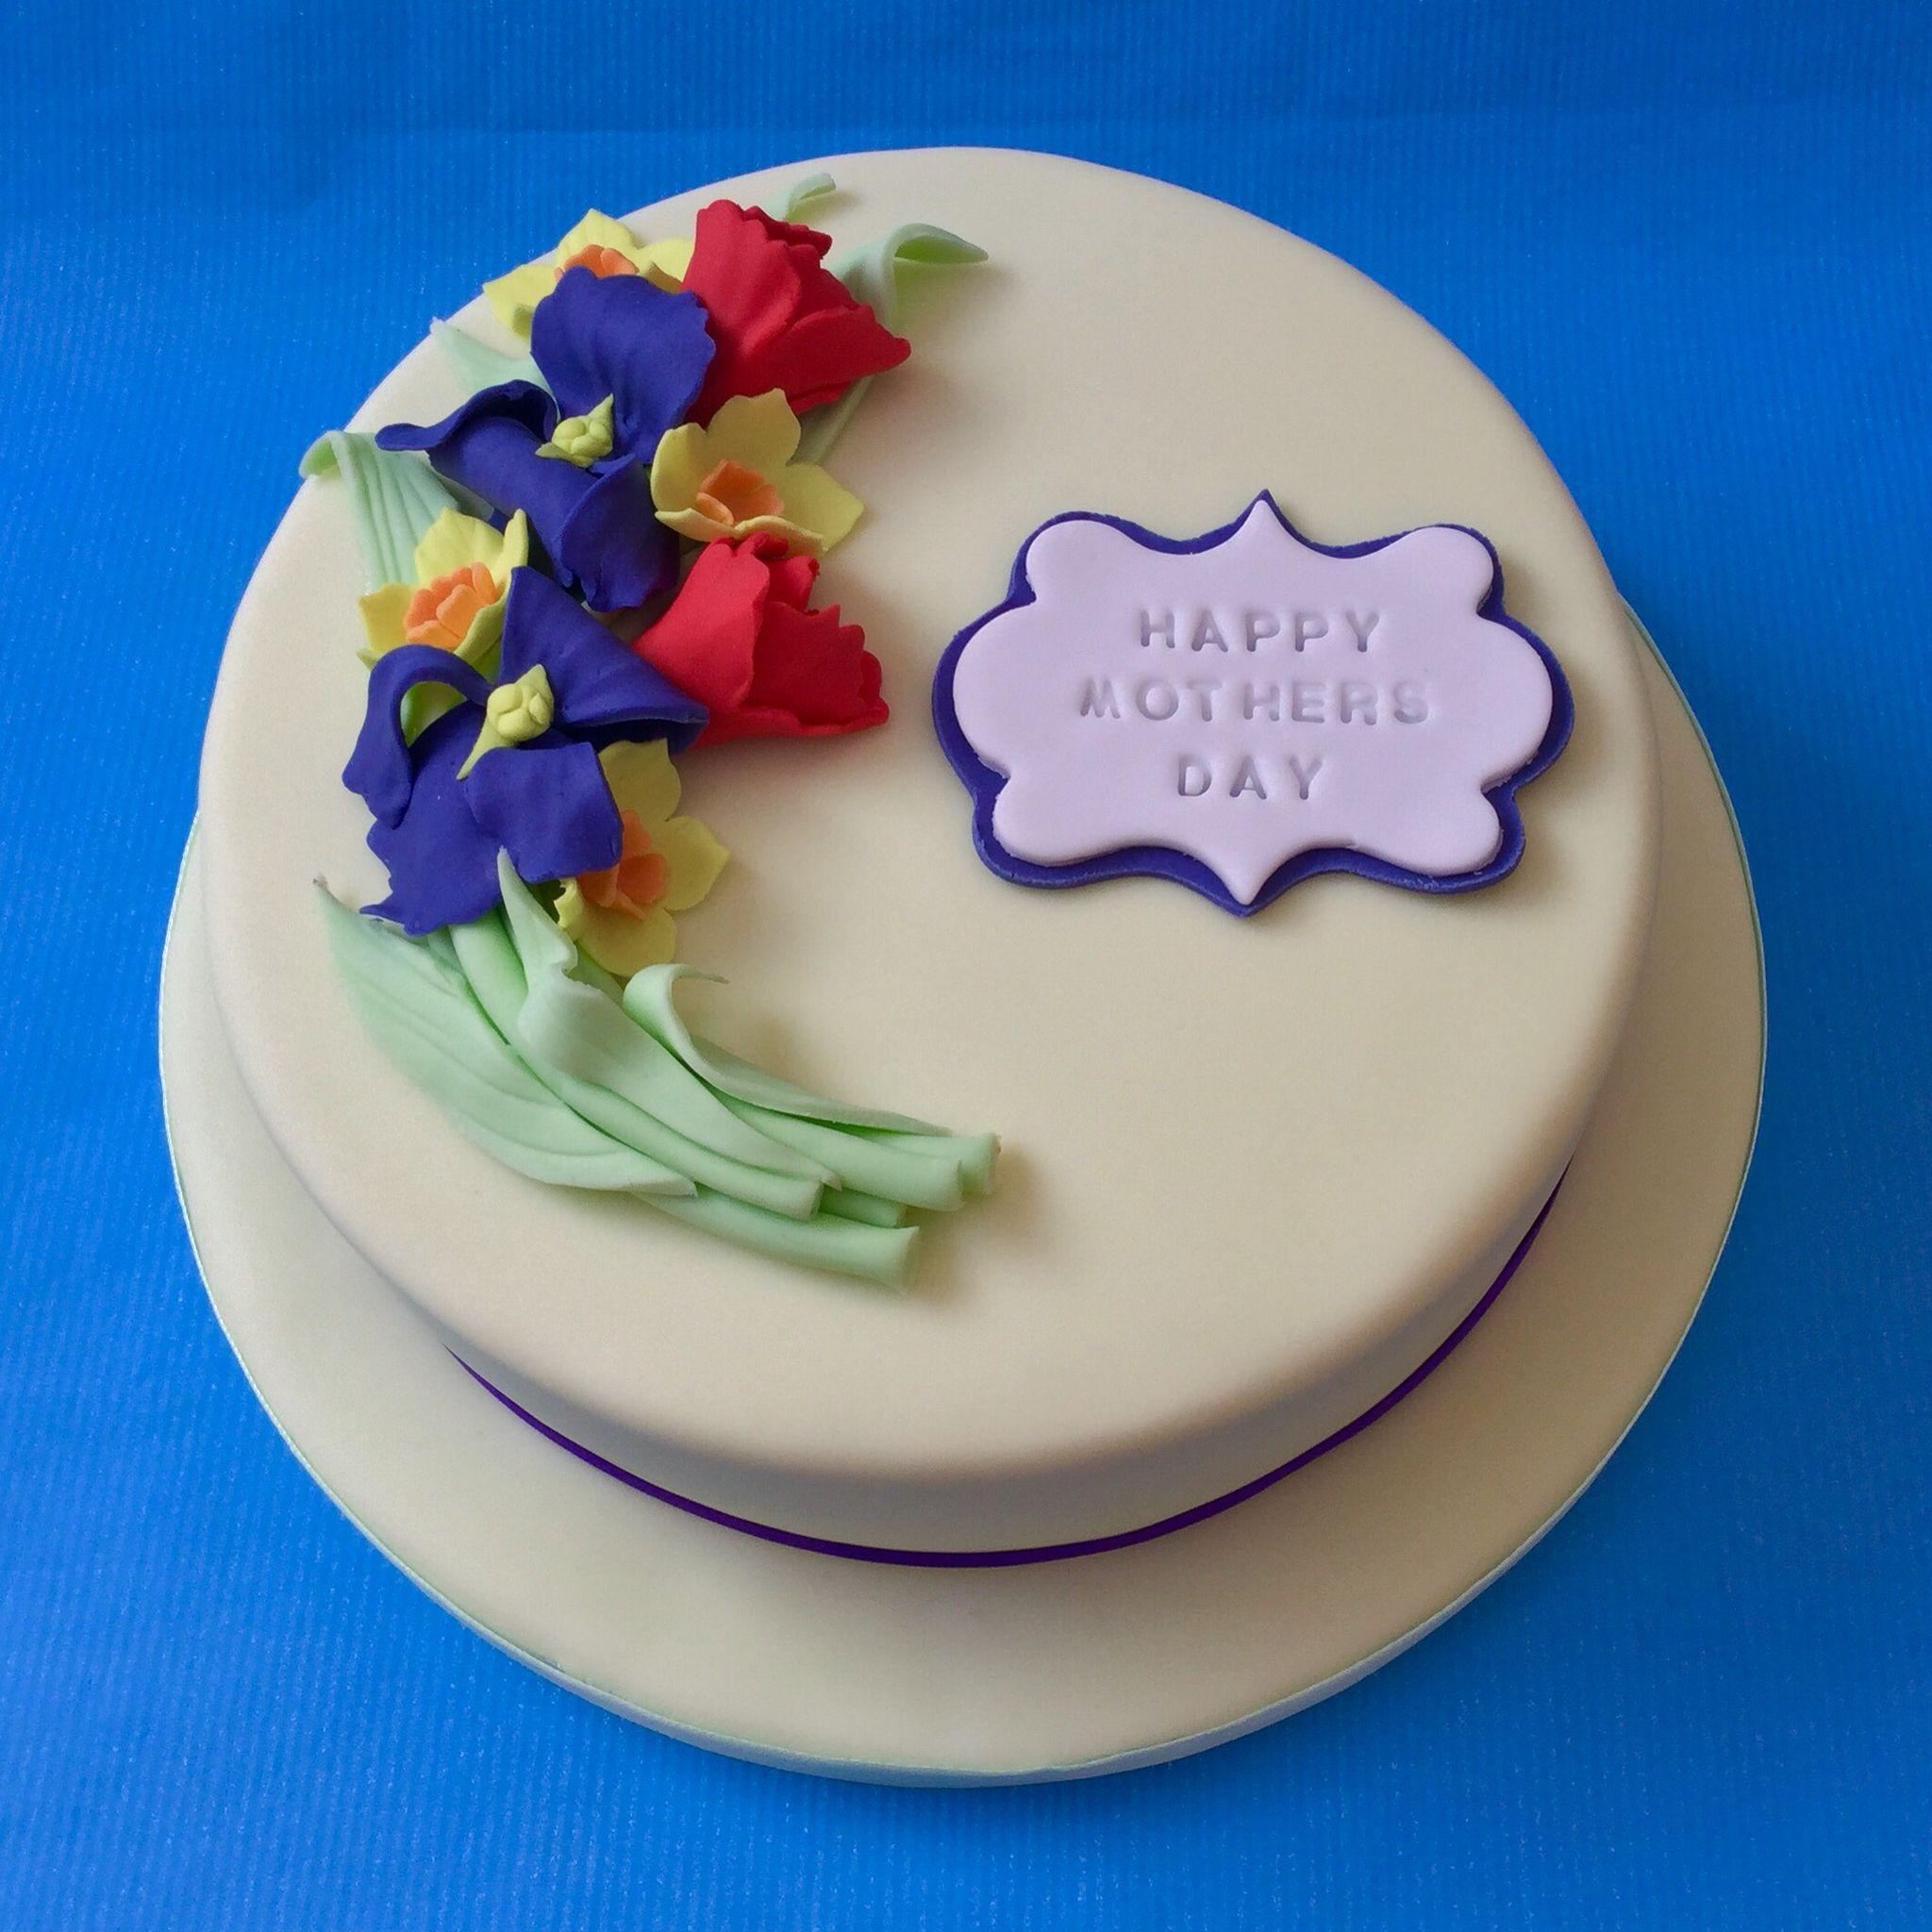 Spring Flowers Cake Cakes I Have Made Pinterest Spring Flower